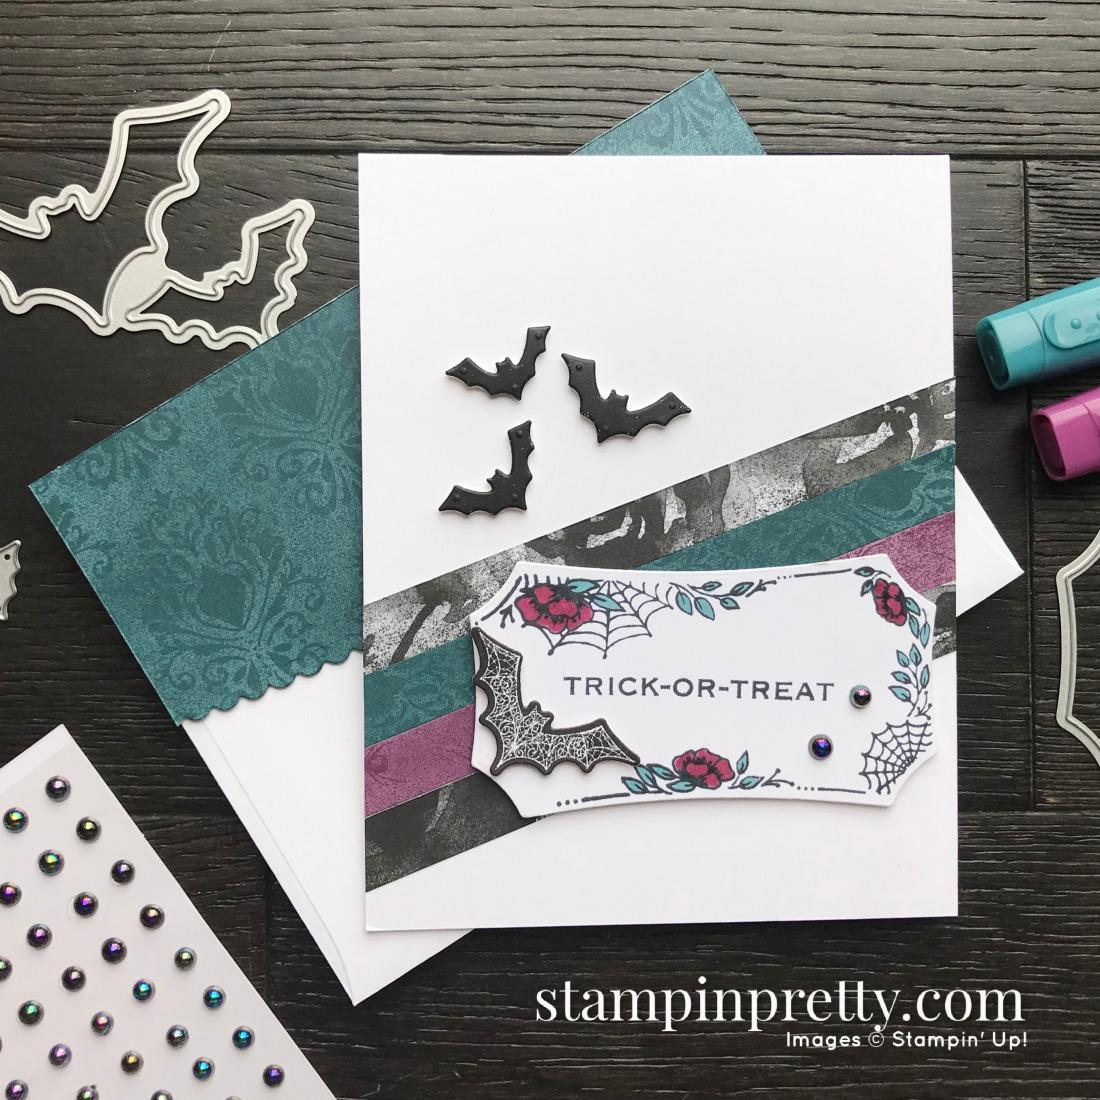 Stampin Up Halloween 2020 SNEAK PEEK! Stampin' Up! Magic In This Night Suite! | Stampin' Pretty